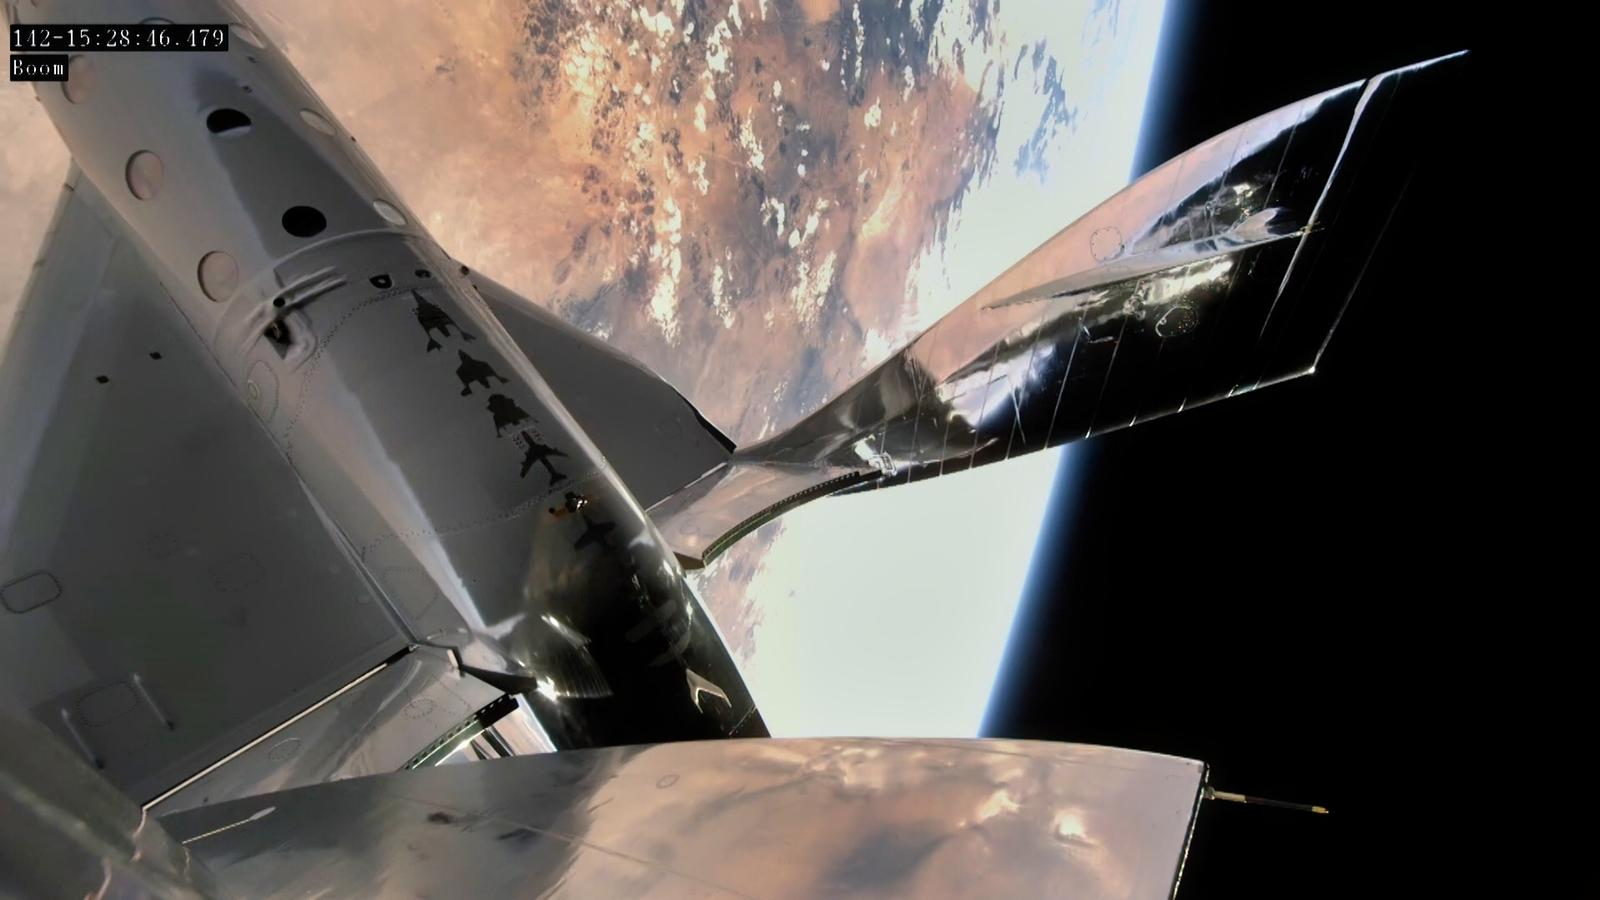 Virgin Galactic's Unity VSS spacecraft went on a suborbital test flight in May 2021.